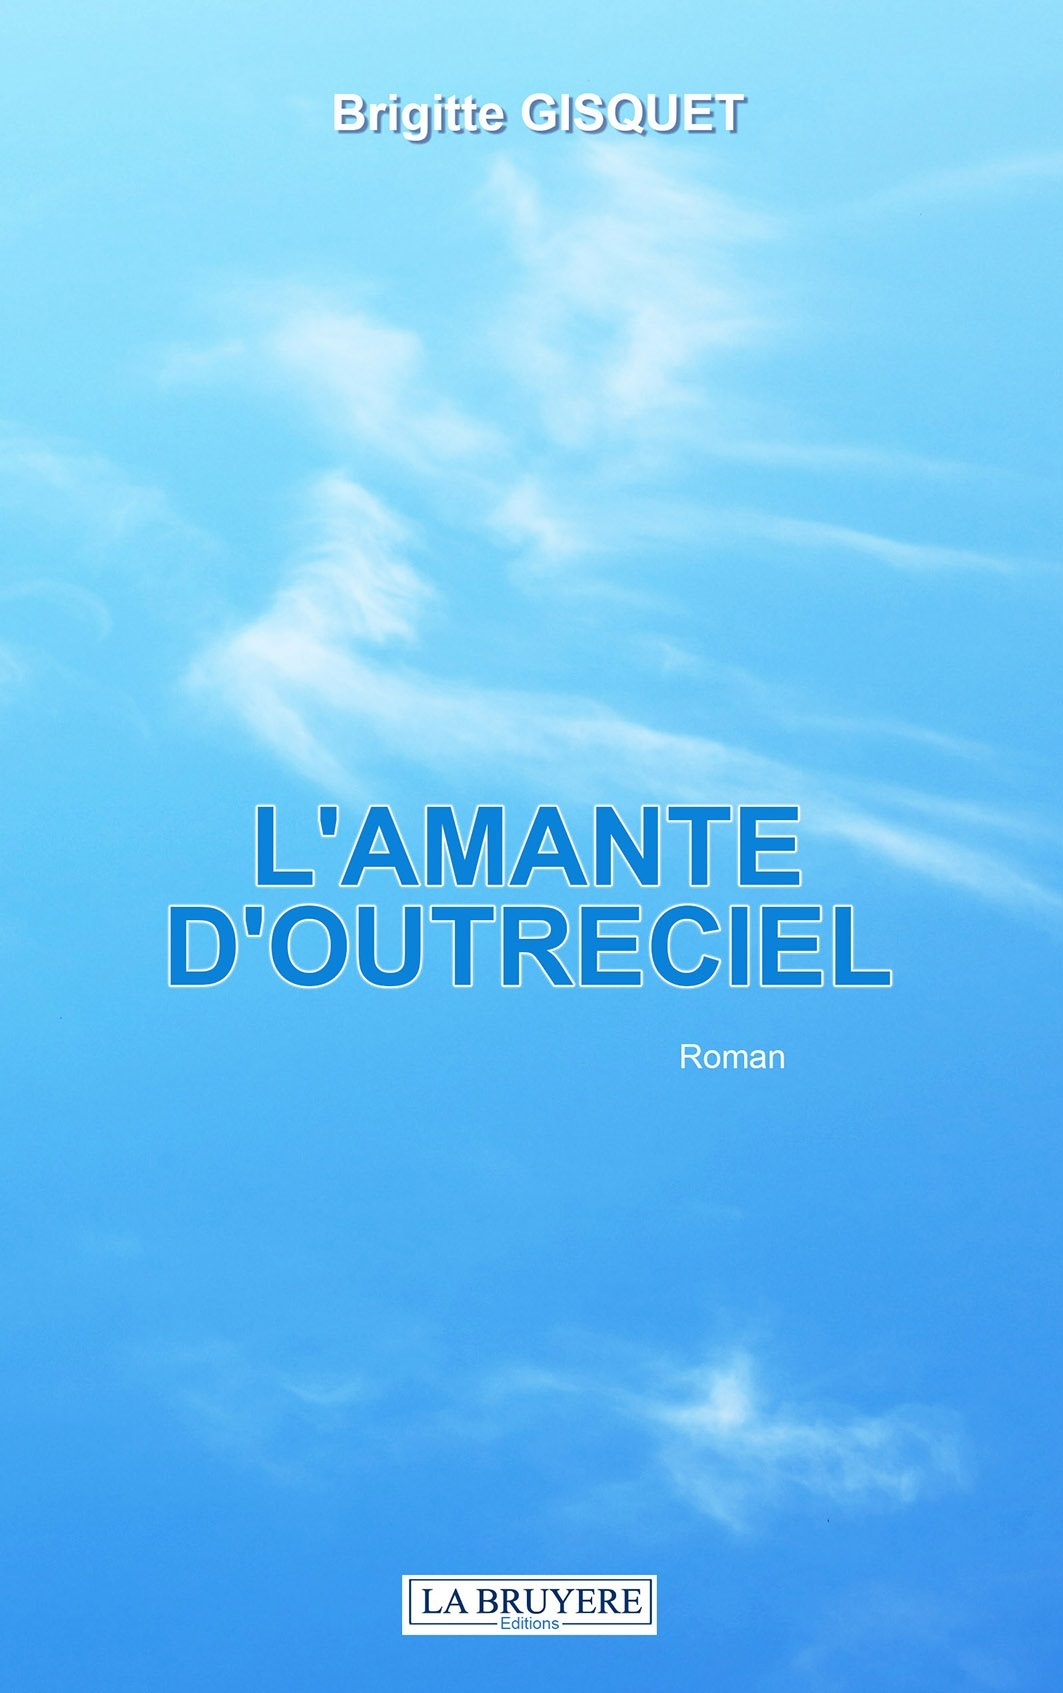 L'AMANTE D'OUITRECIEL